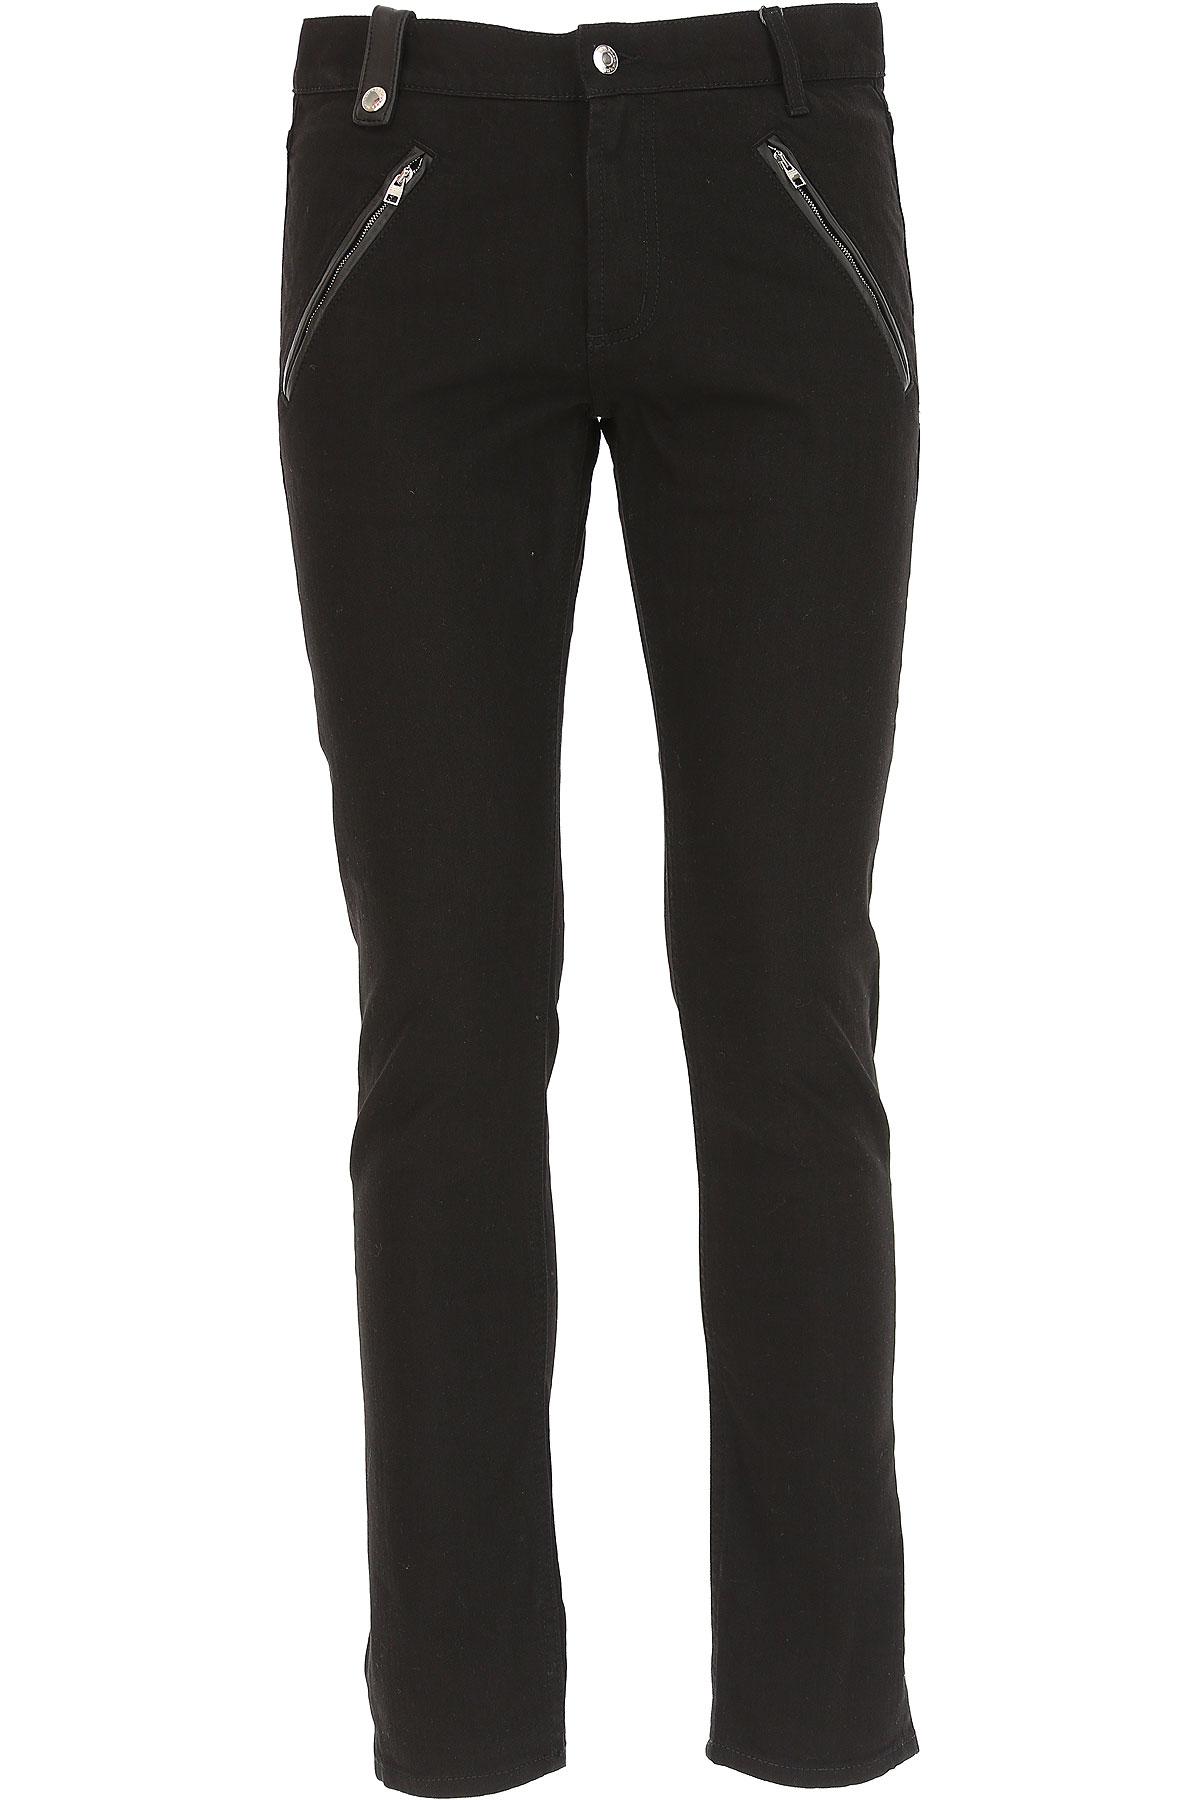 Image of Alexander McQueen Jeans, Black, Cotton, 2017, 30 34